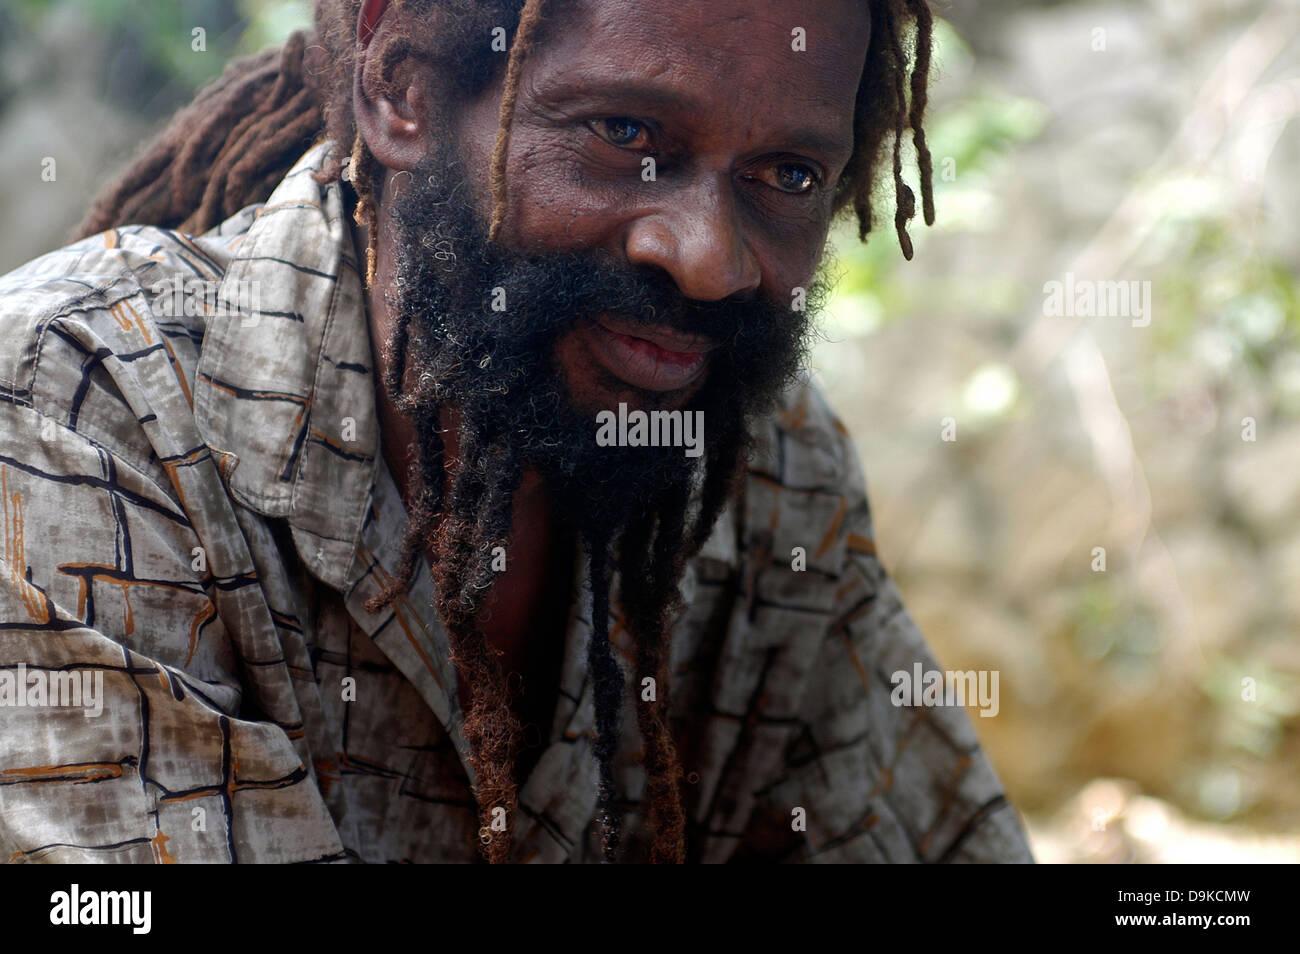 Rastafari African American Man With Dreadlocks At Negril